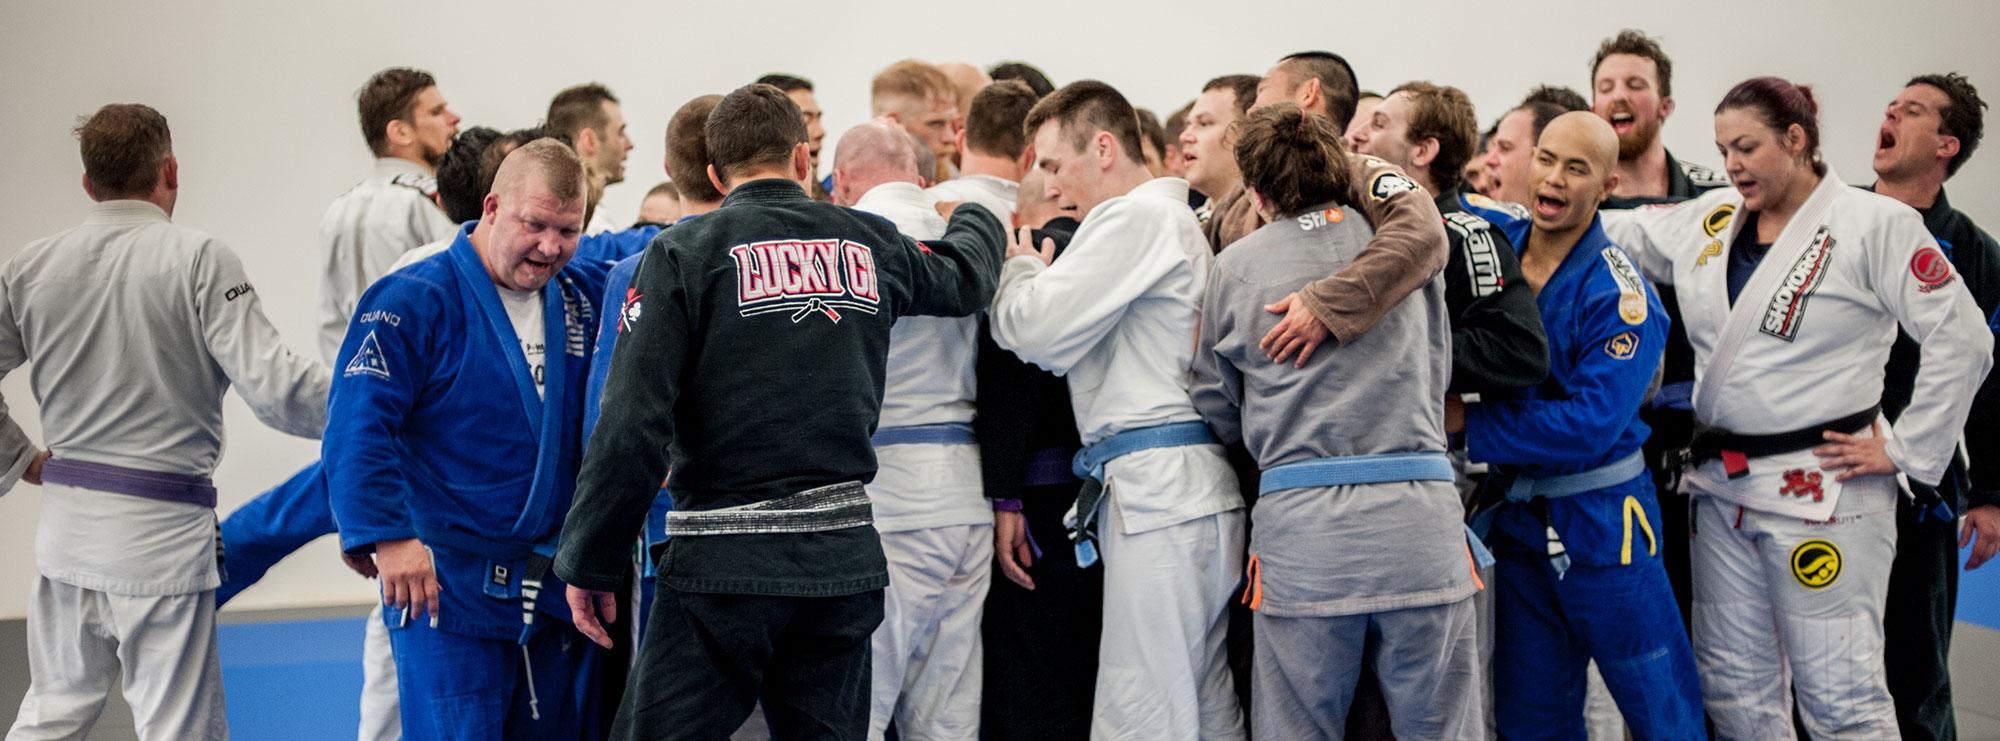 Membership – Impact Jiu Jitsu